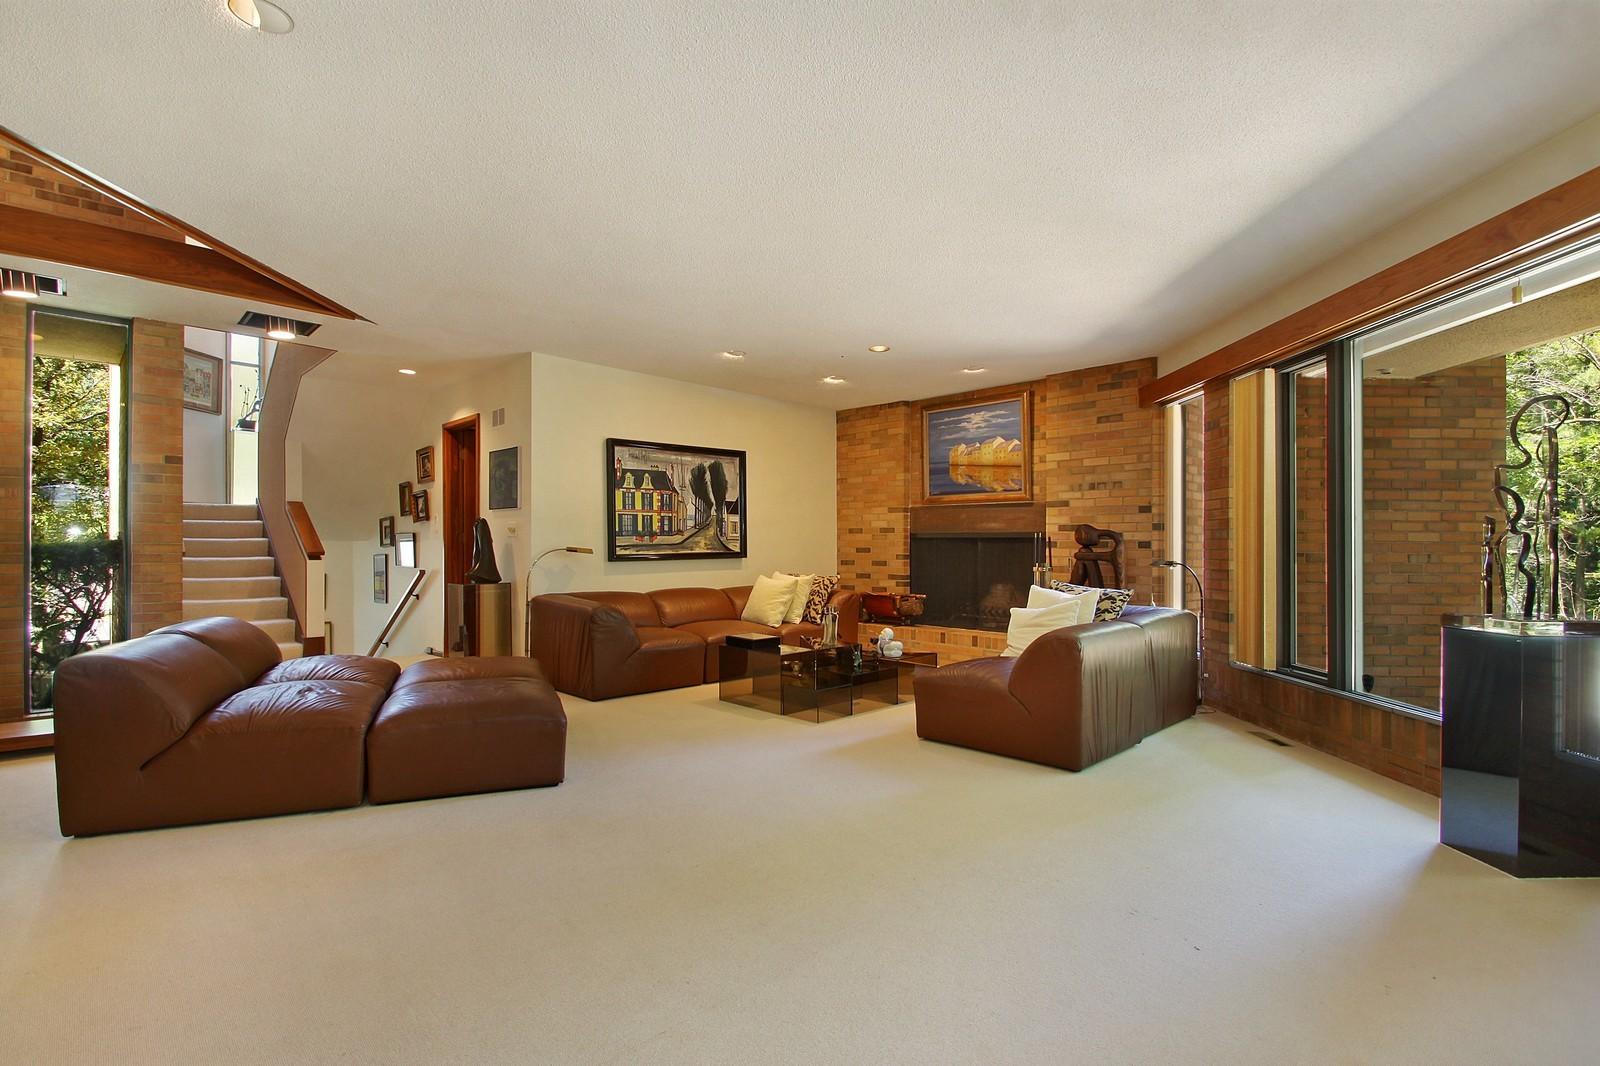 Real Estate Photography - 350 Sunrise Circle, Glencoe, IL, 60022 - Living Room